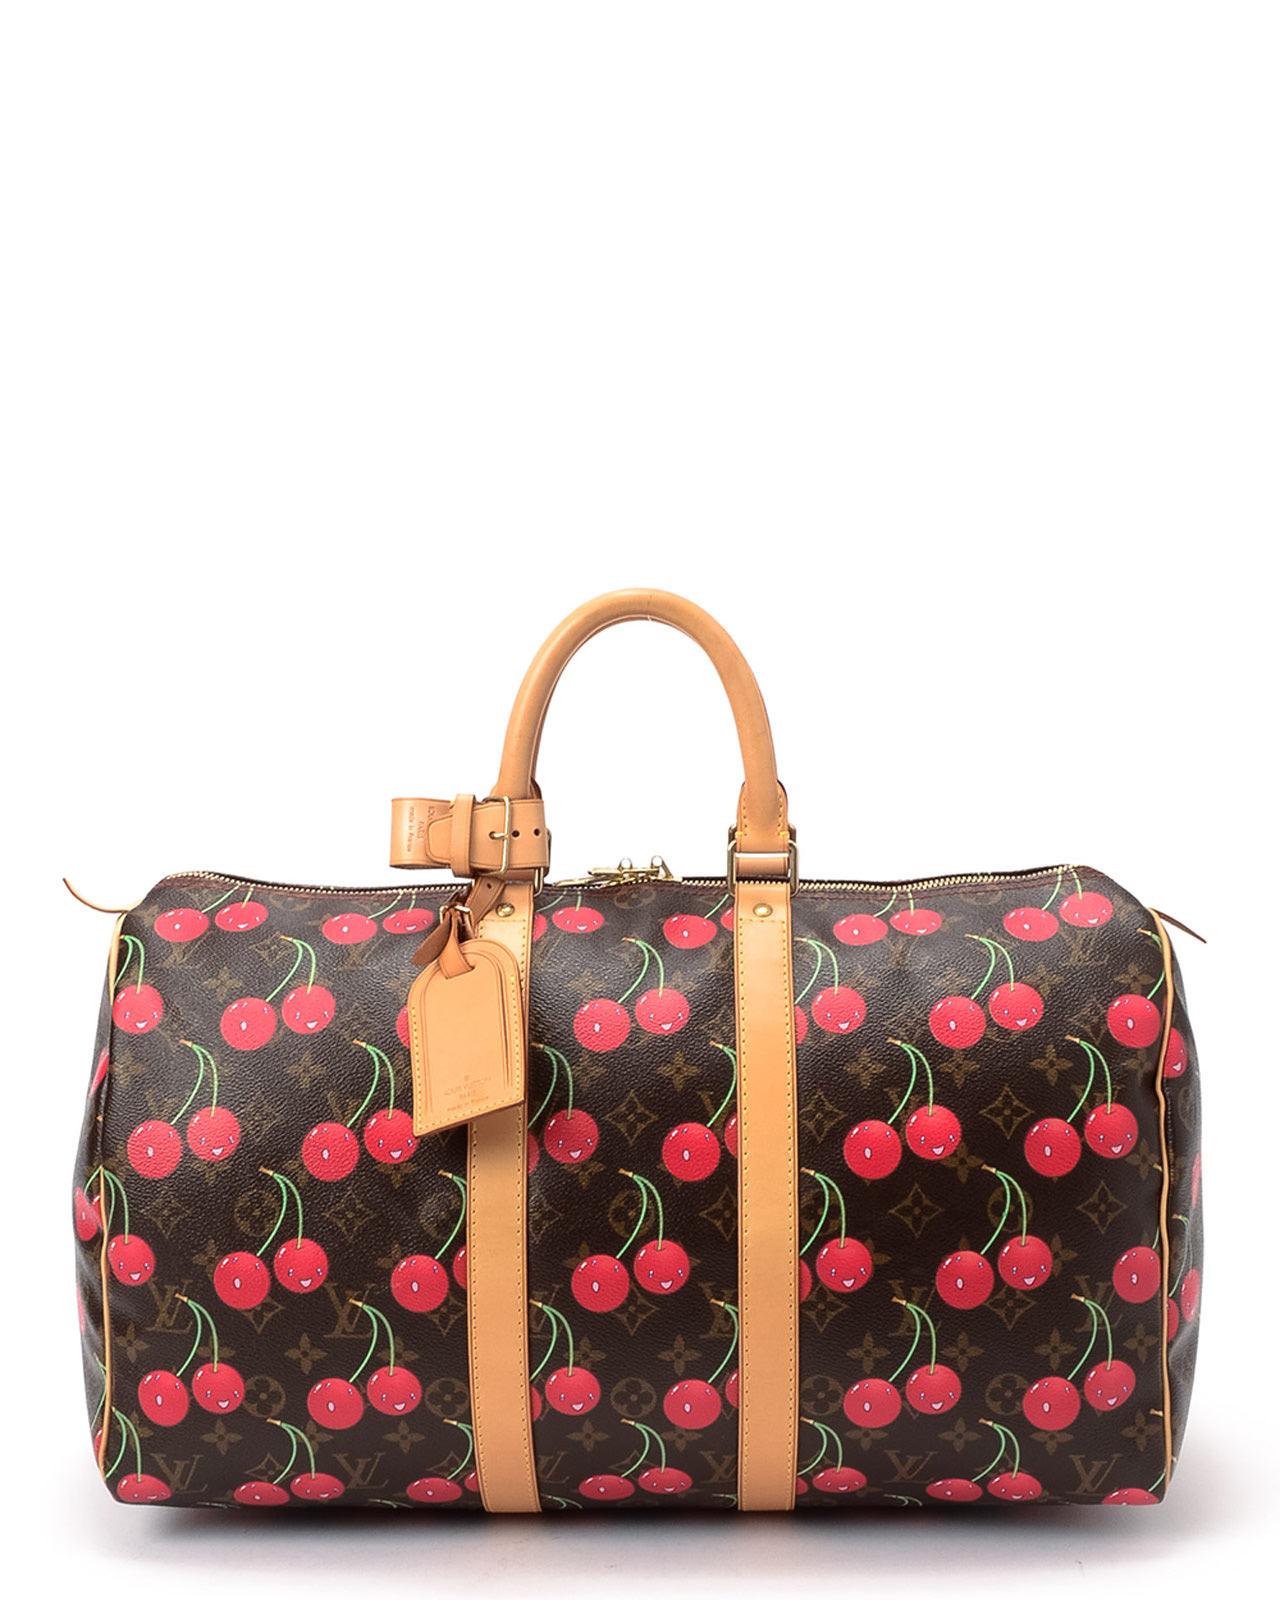 louis vuitton monogram cherry keepall 45 handbag in pink